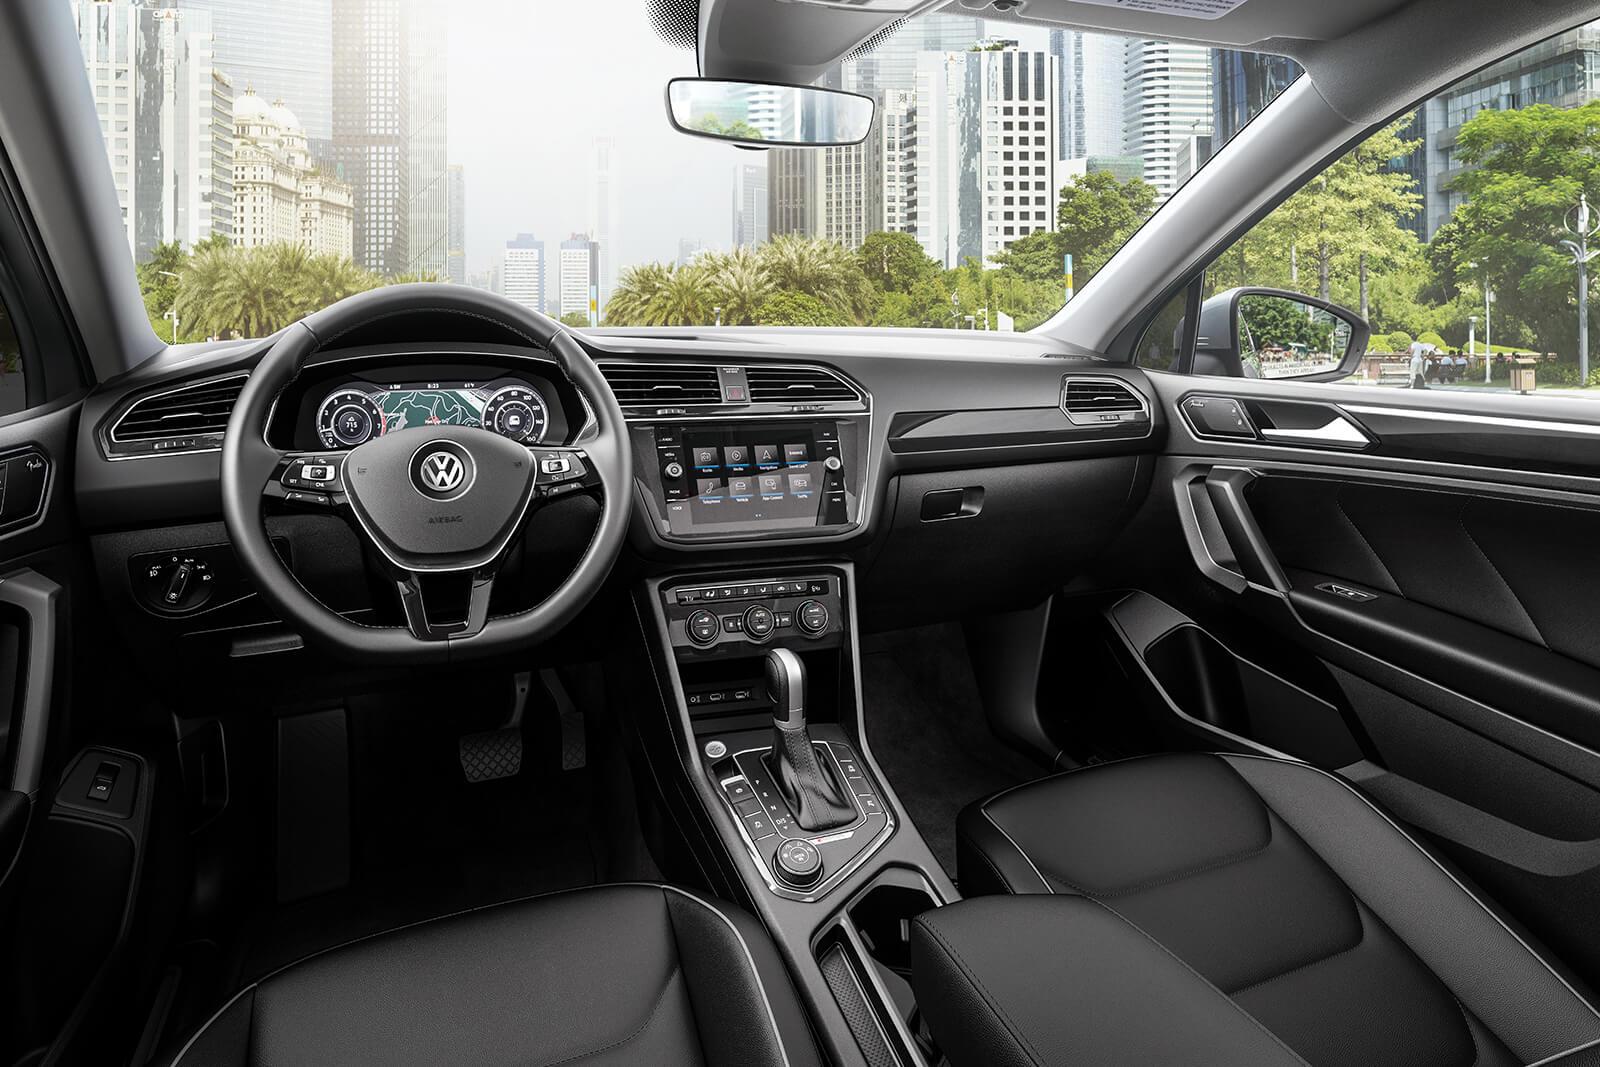 2018 Tiguan Cockpit